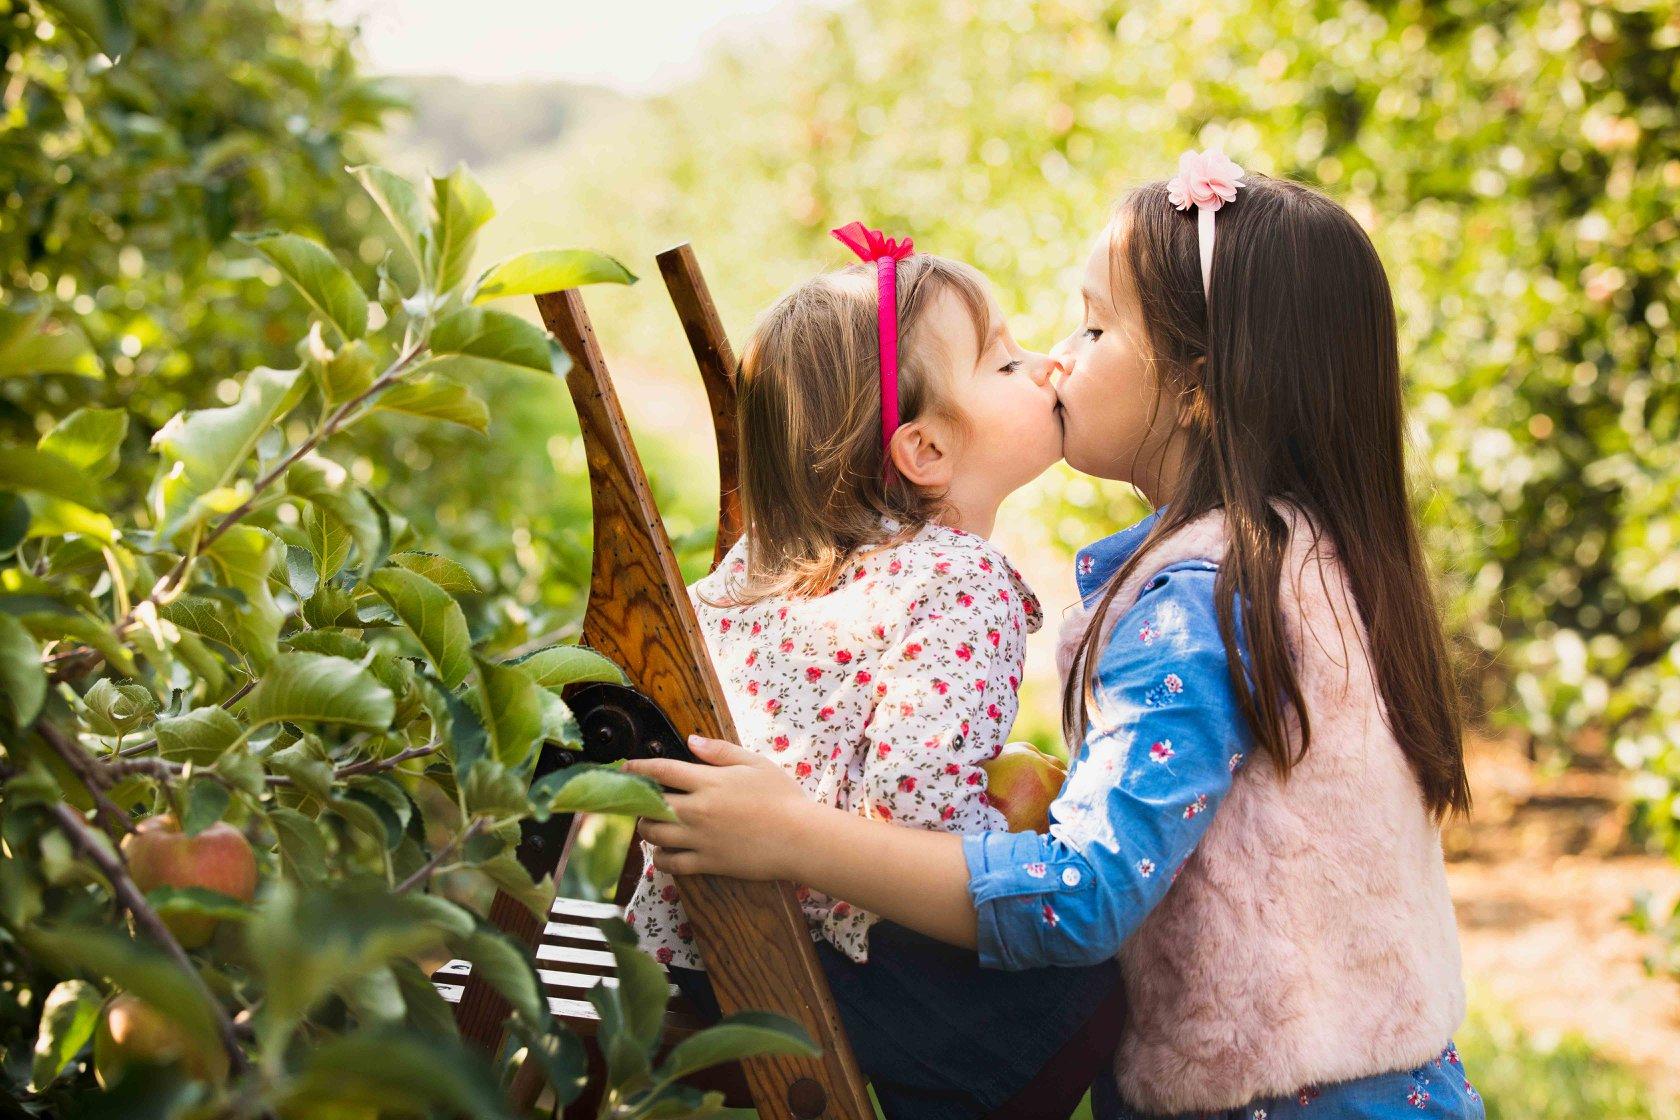 apples 2 kiss